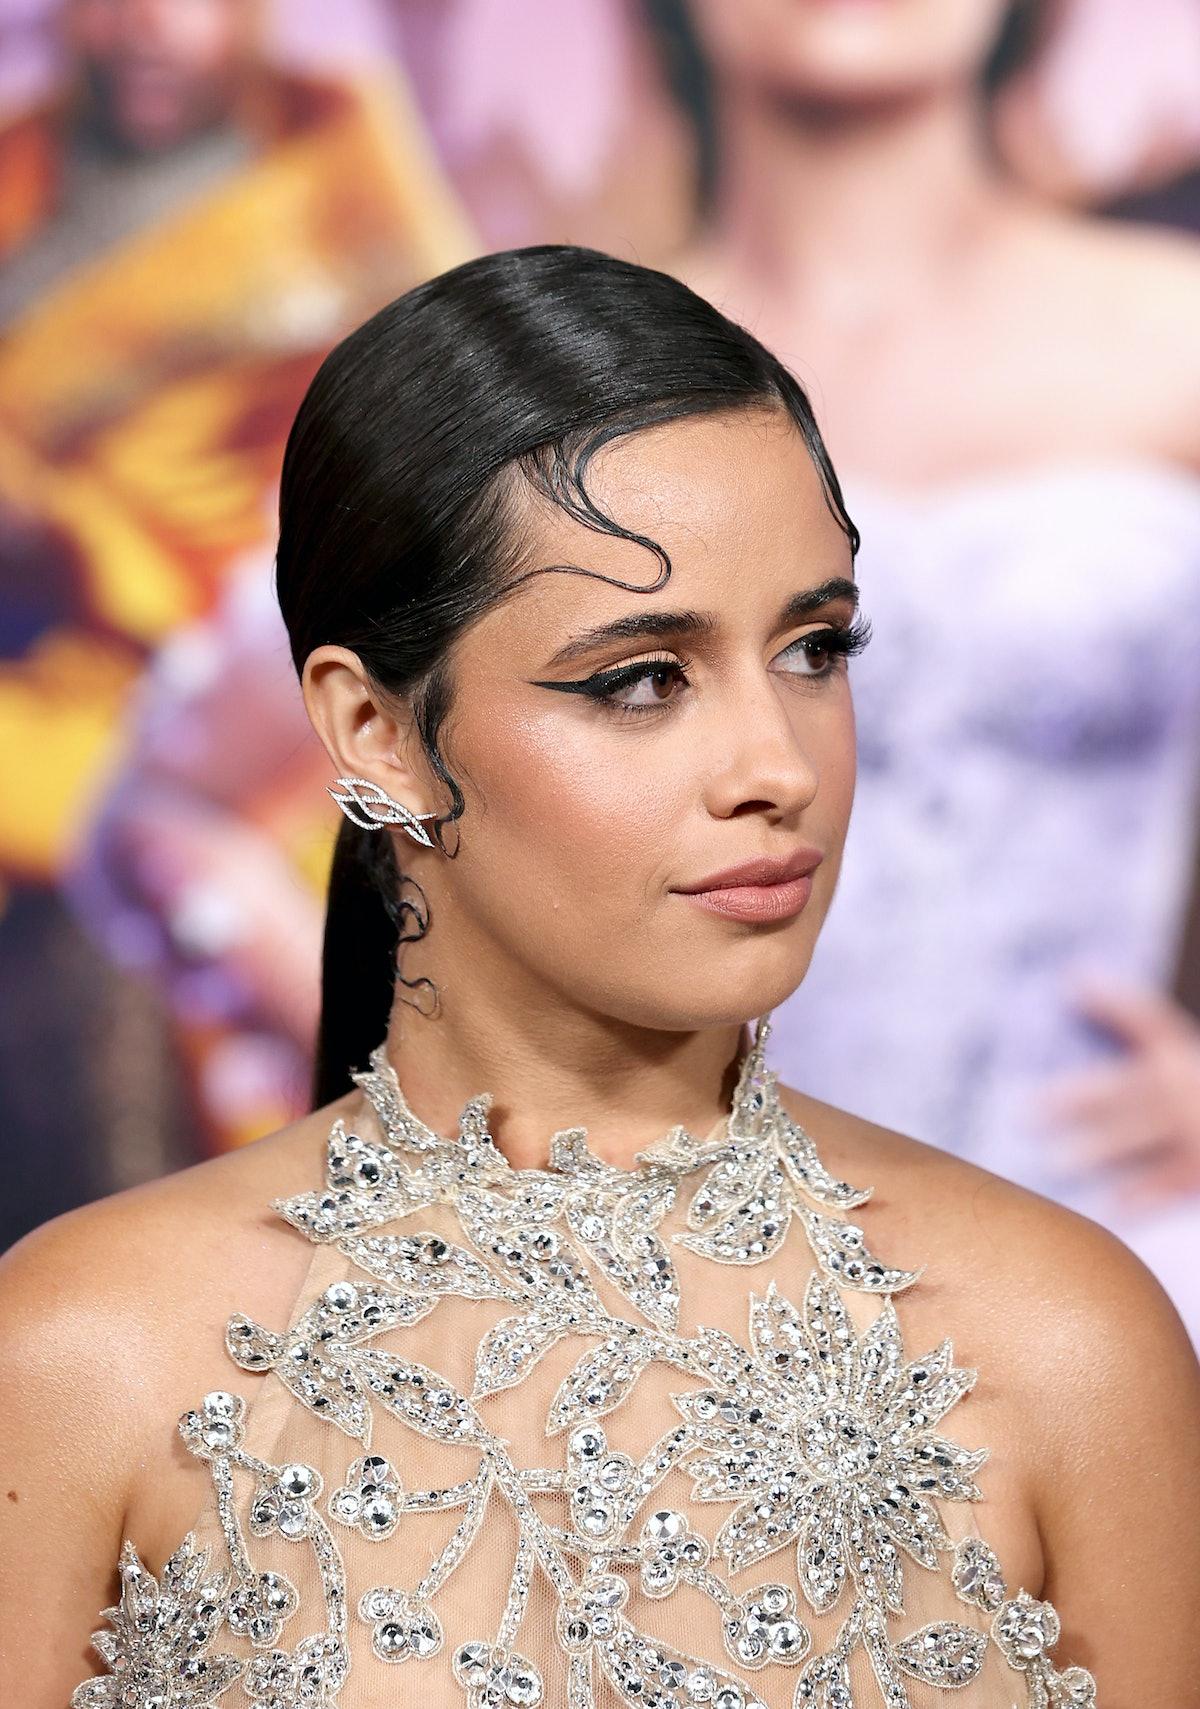 LOS ANGELES, CALIFORNIA - AUGUST 30: Camila Cabello attends the Los Angeles Premiere of Amazon Studi...